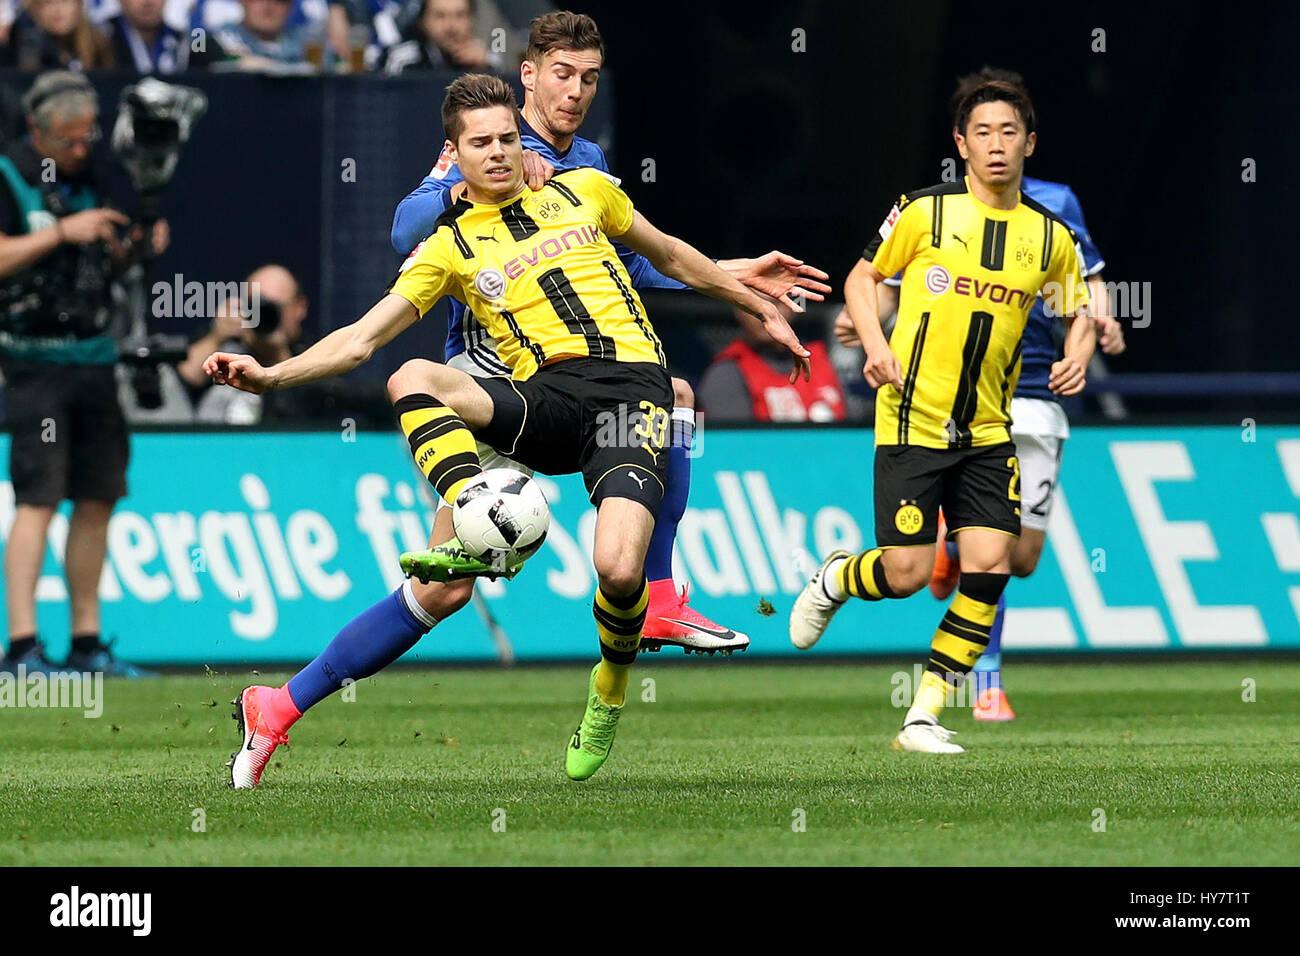 Gelsenkirchen. 1er avril 2017. Leon Goretzkai (R2) de FC Schalke 04 rivalise avec Julian Weigl (L) du Borussia Dortmund Banque D'Images